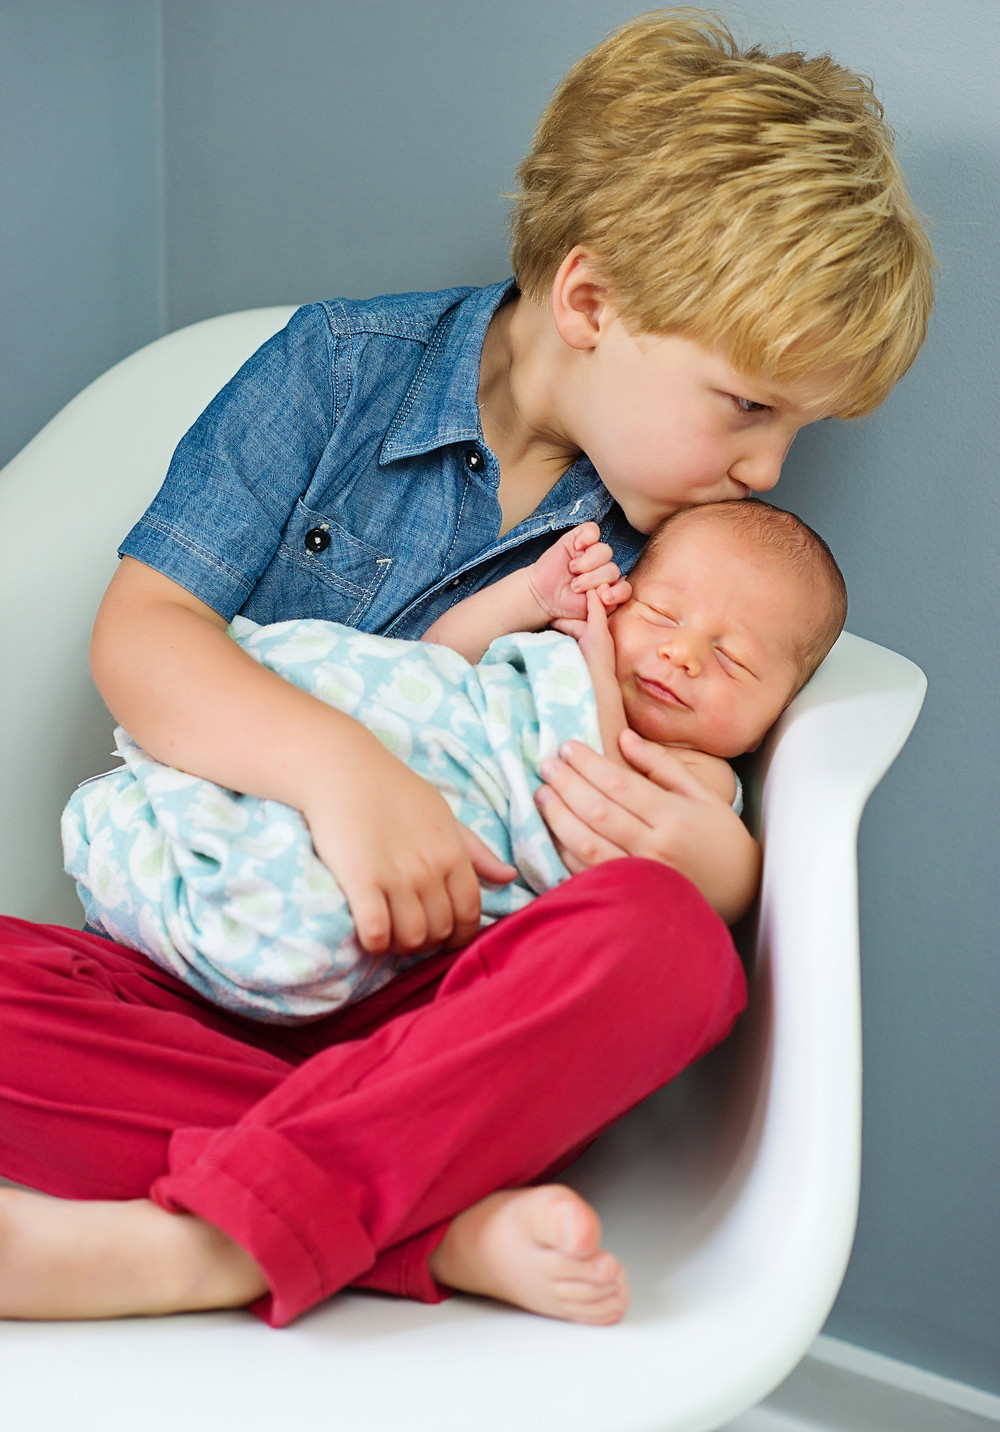 Newborn Tiny and little man